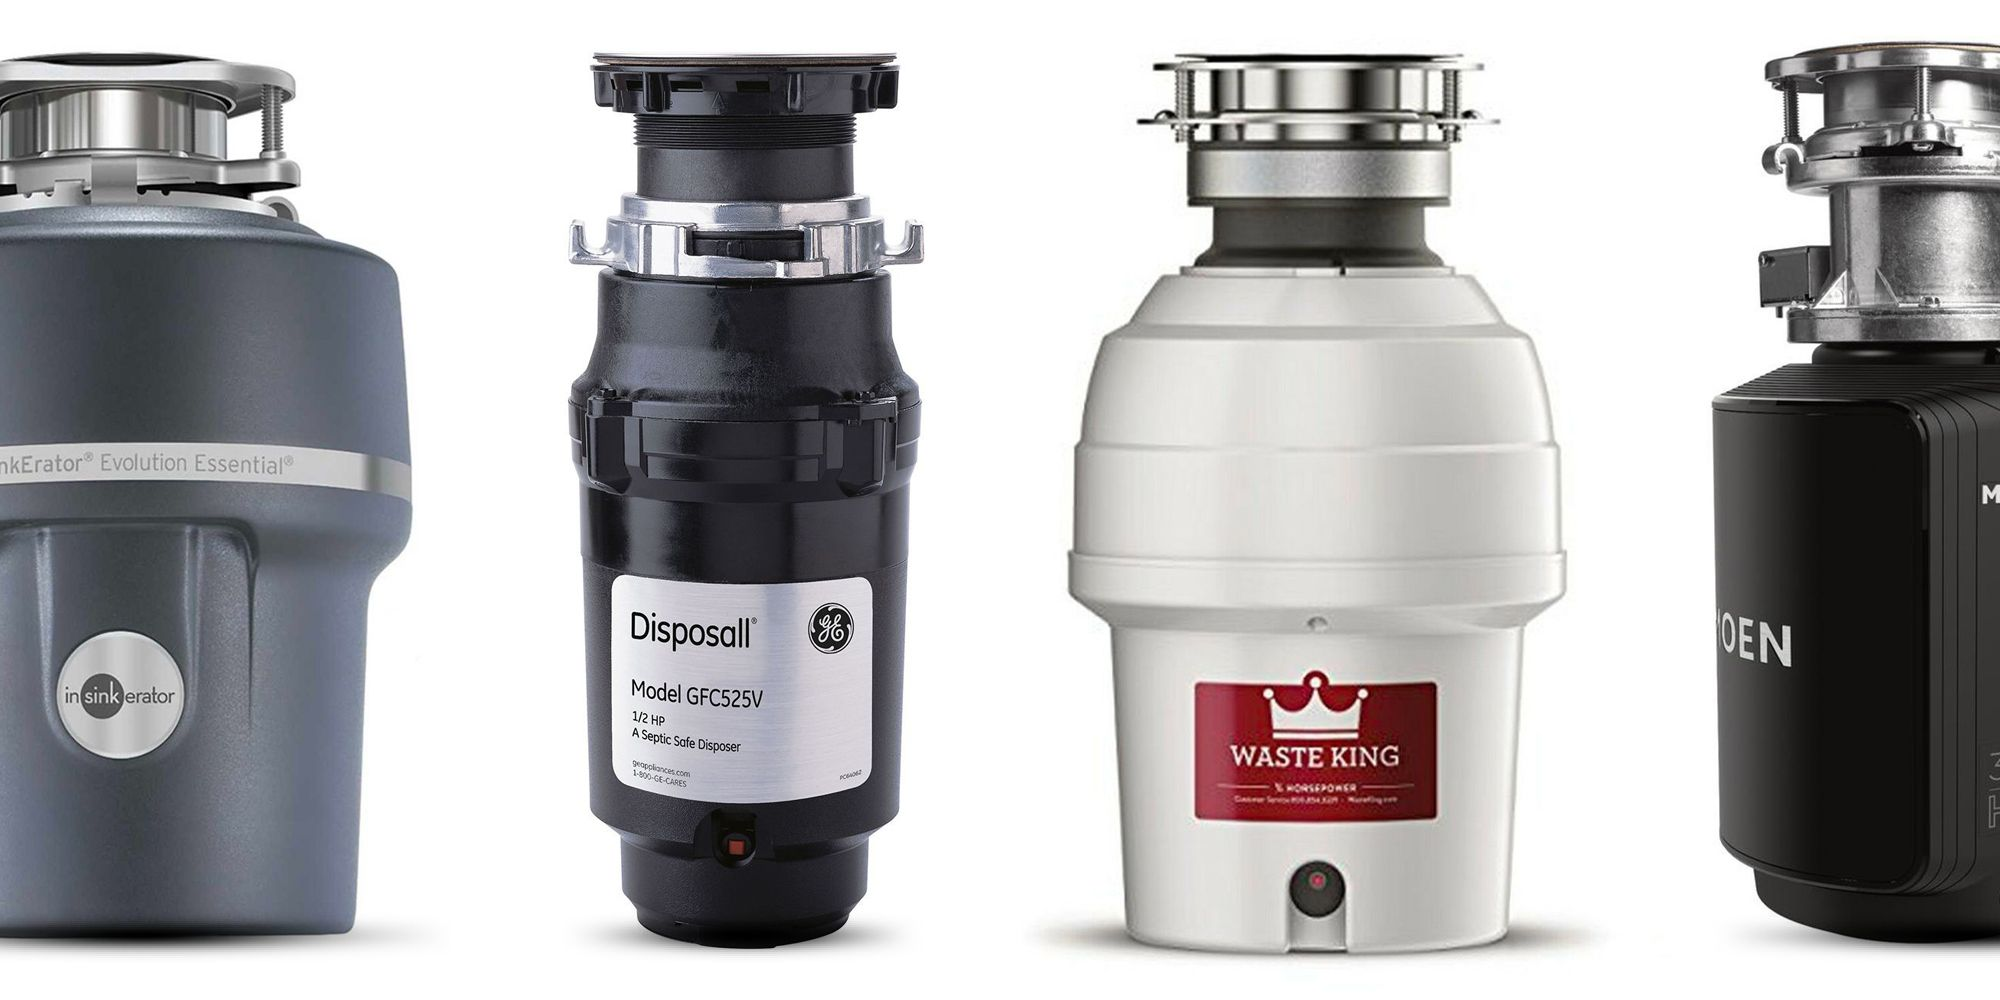 Best Garbage Disposals 2019 Sink Disposal Reviews